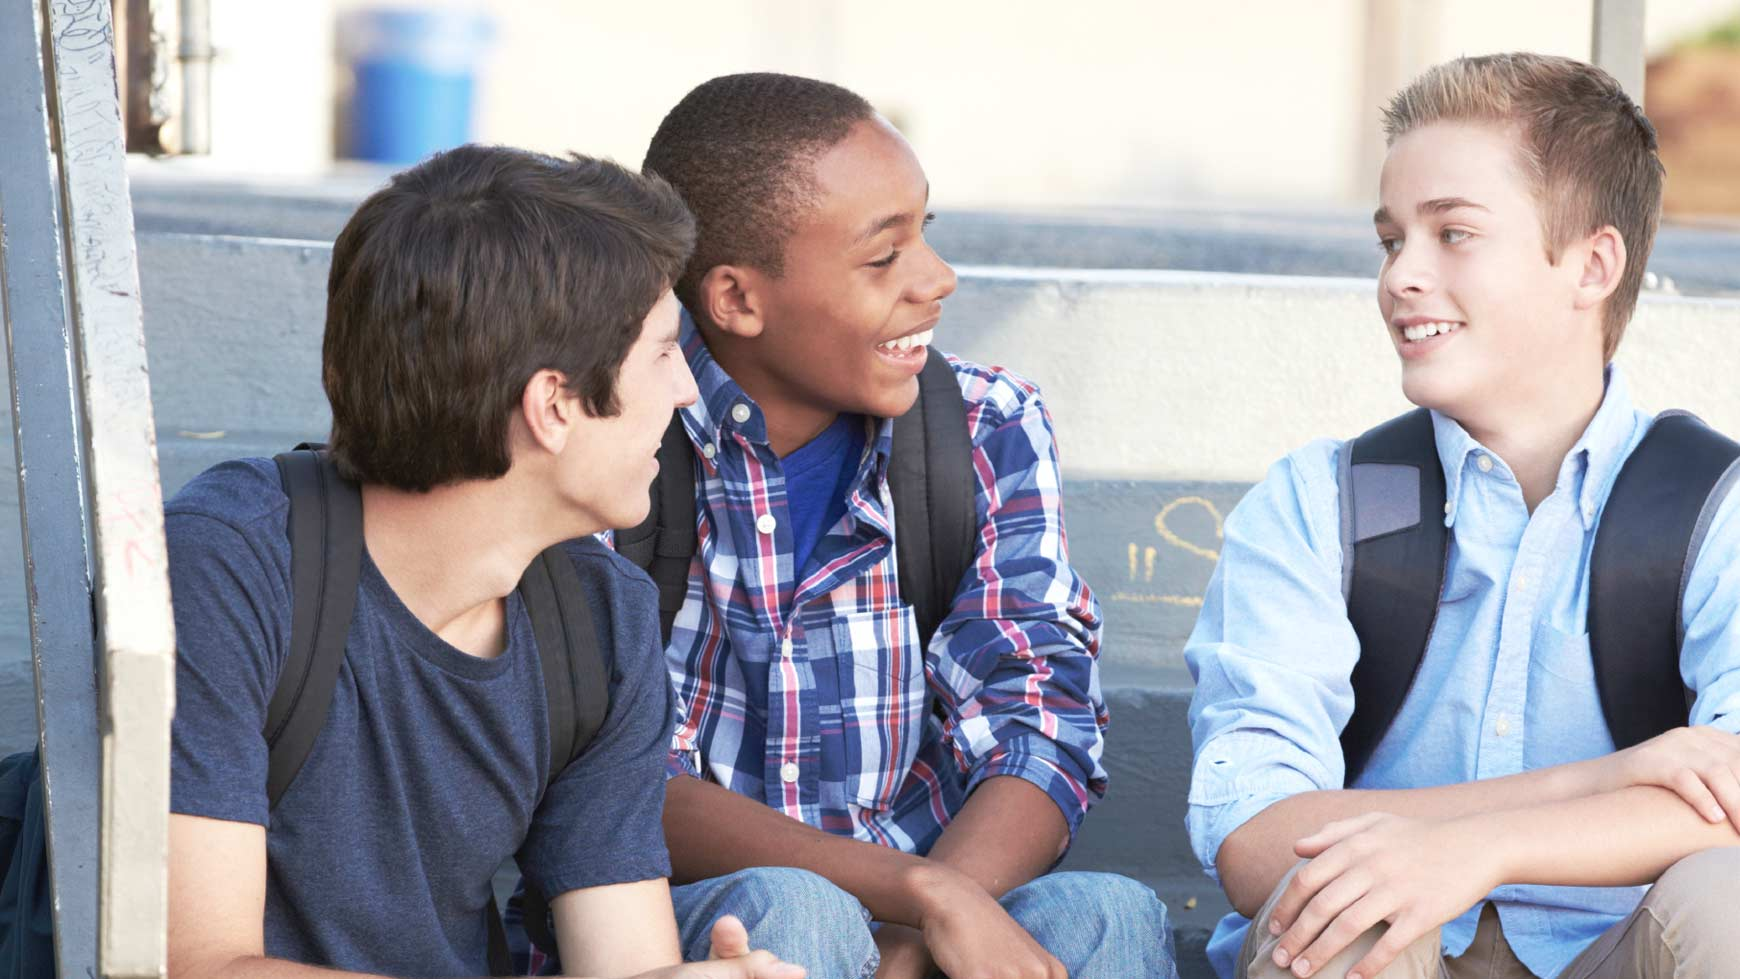 Help Your Middle Schooler Make Friends